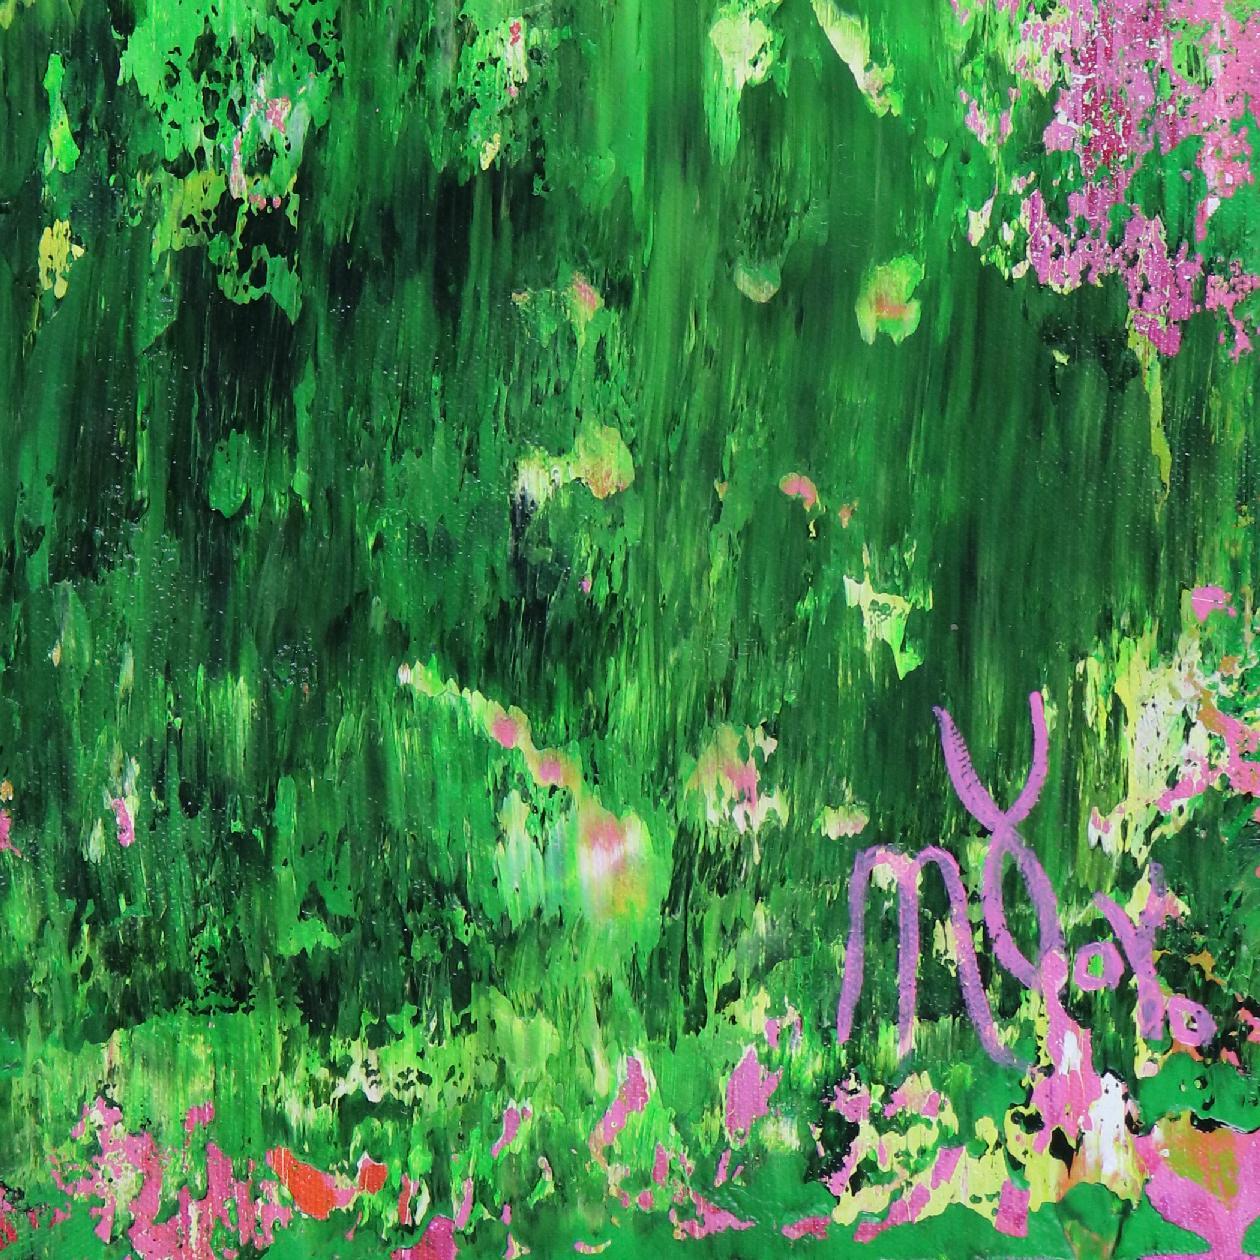 Signature - Verdor (A Romance With Green) 3 by Nestor Toro